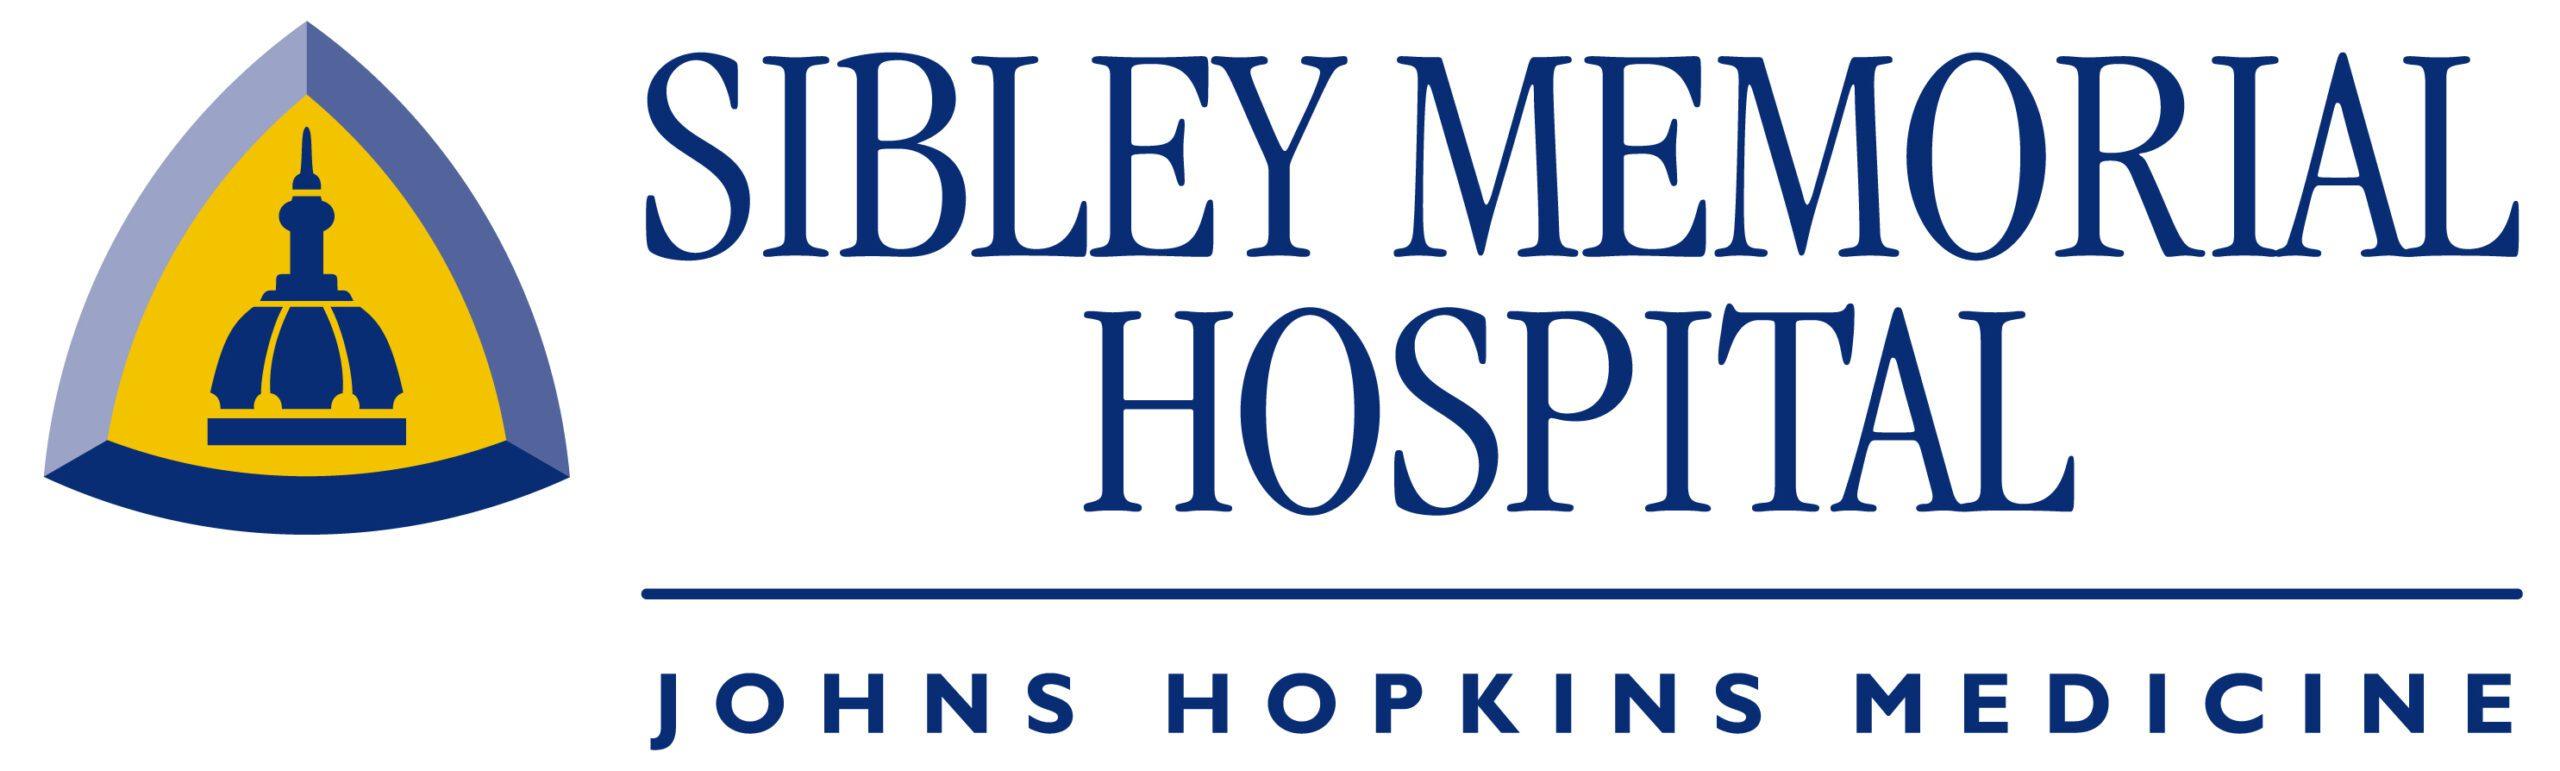 Sibley Memorial Hopsital